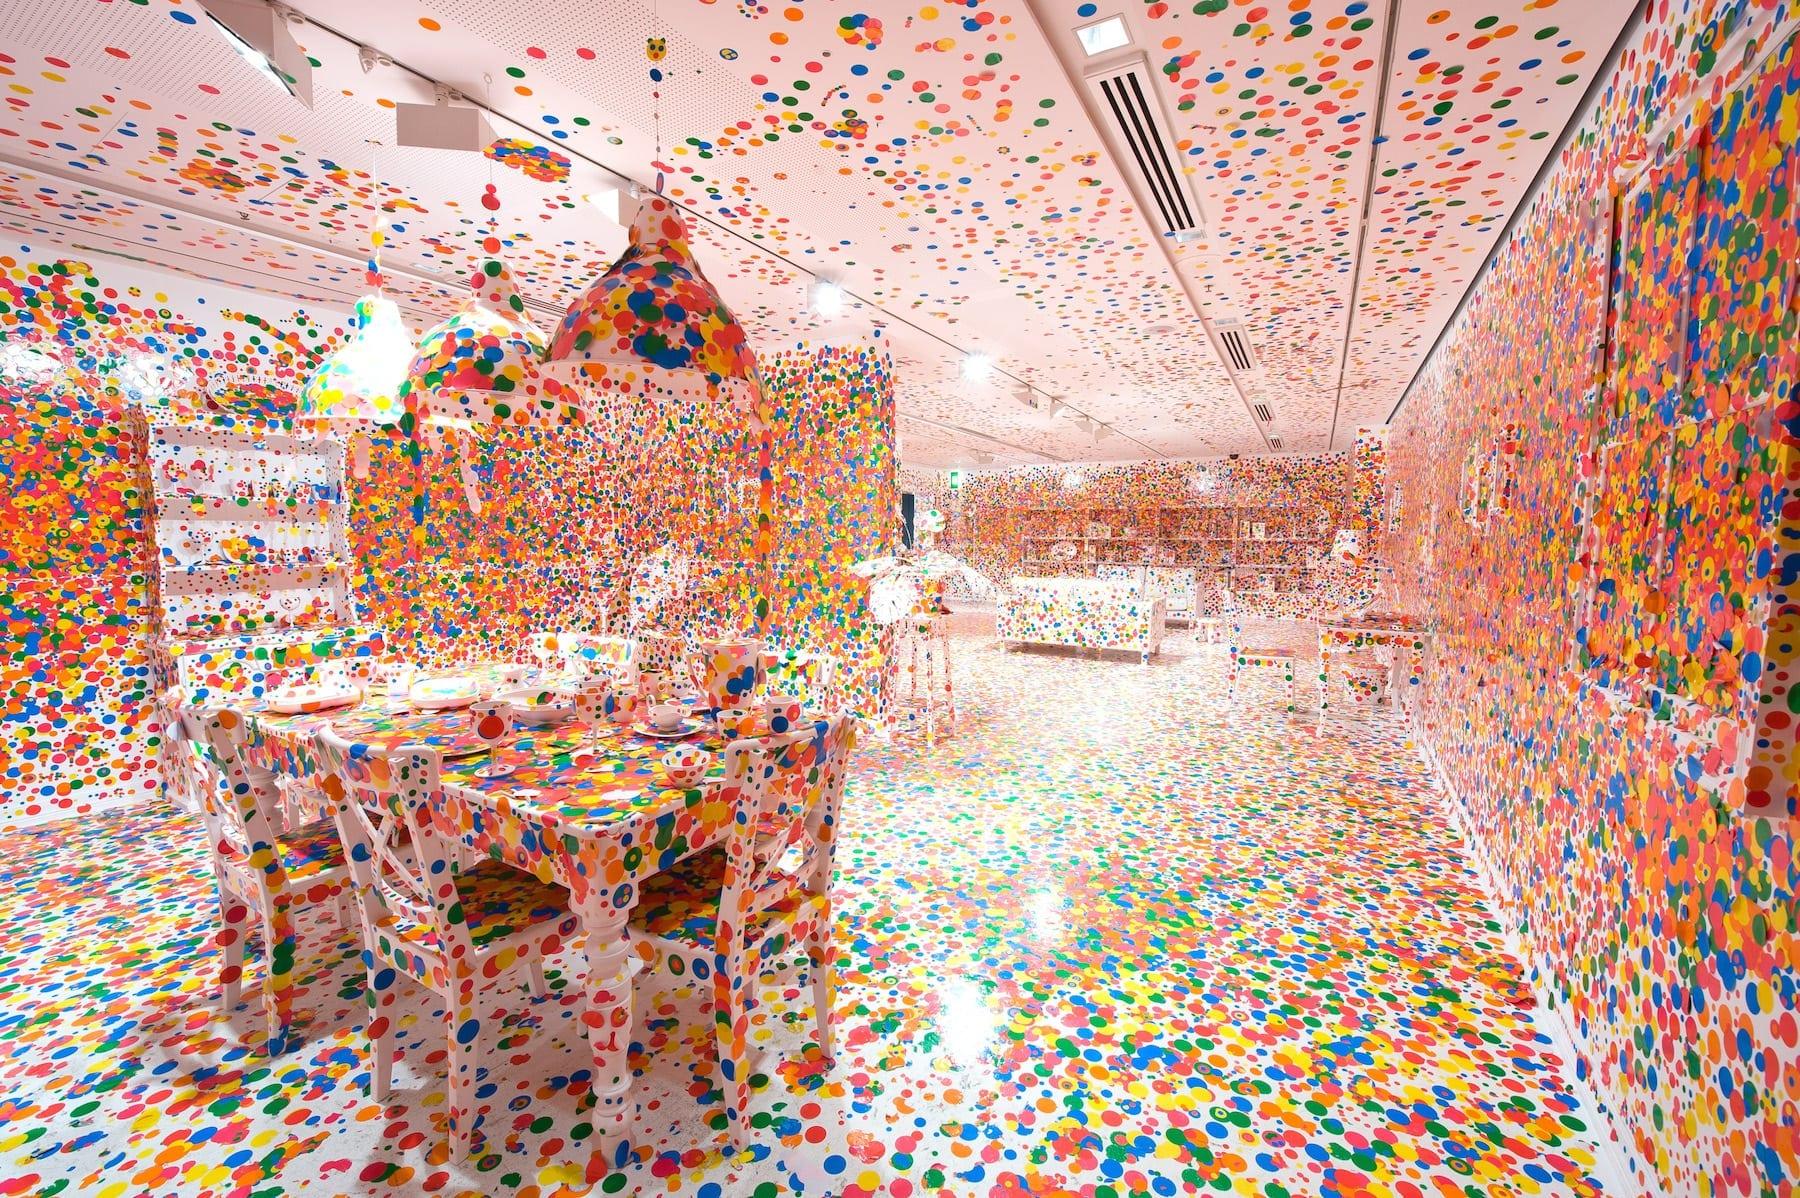 Yayoi Kusama, The Obliteration Room, 2002 to present